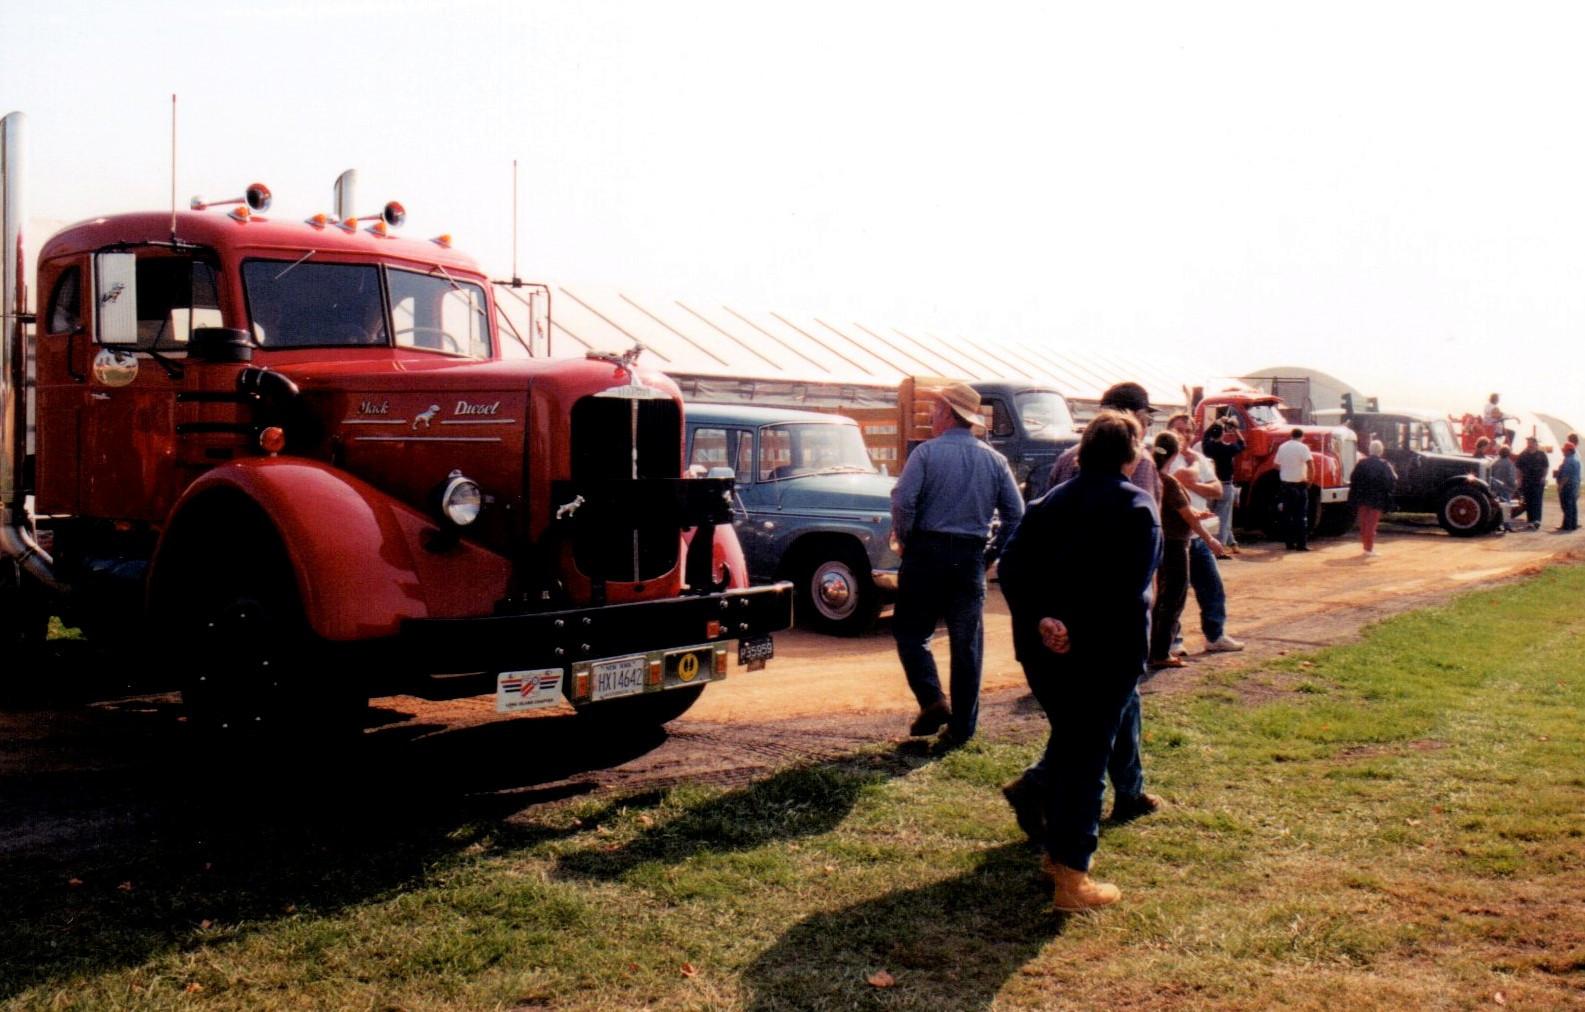 Member's trucks at Talmage Farm in Baiting Hollow